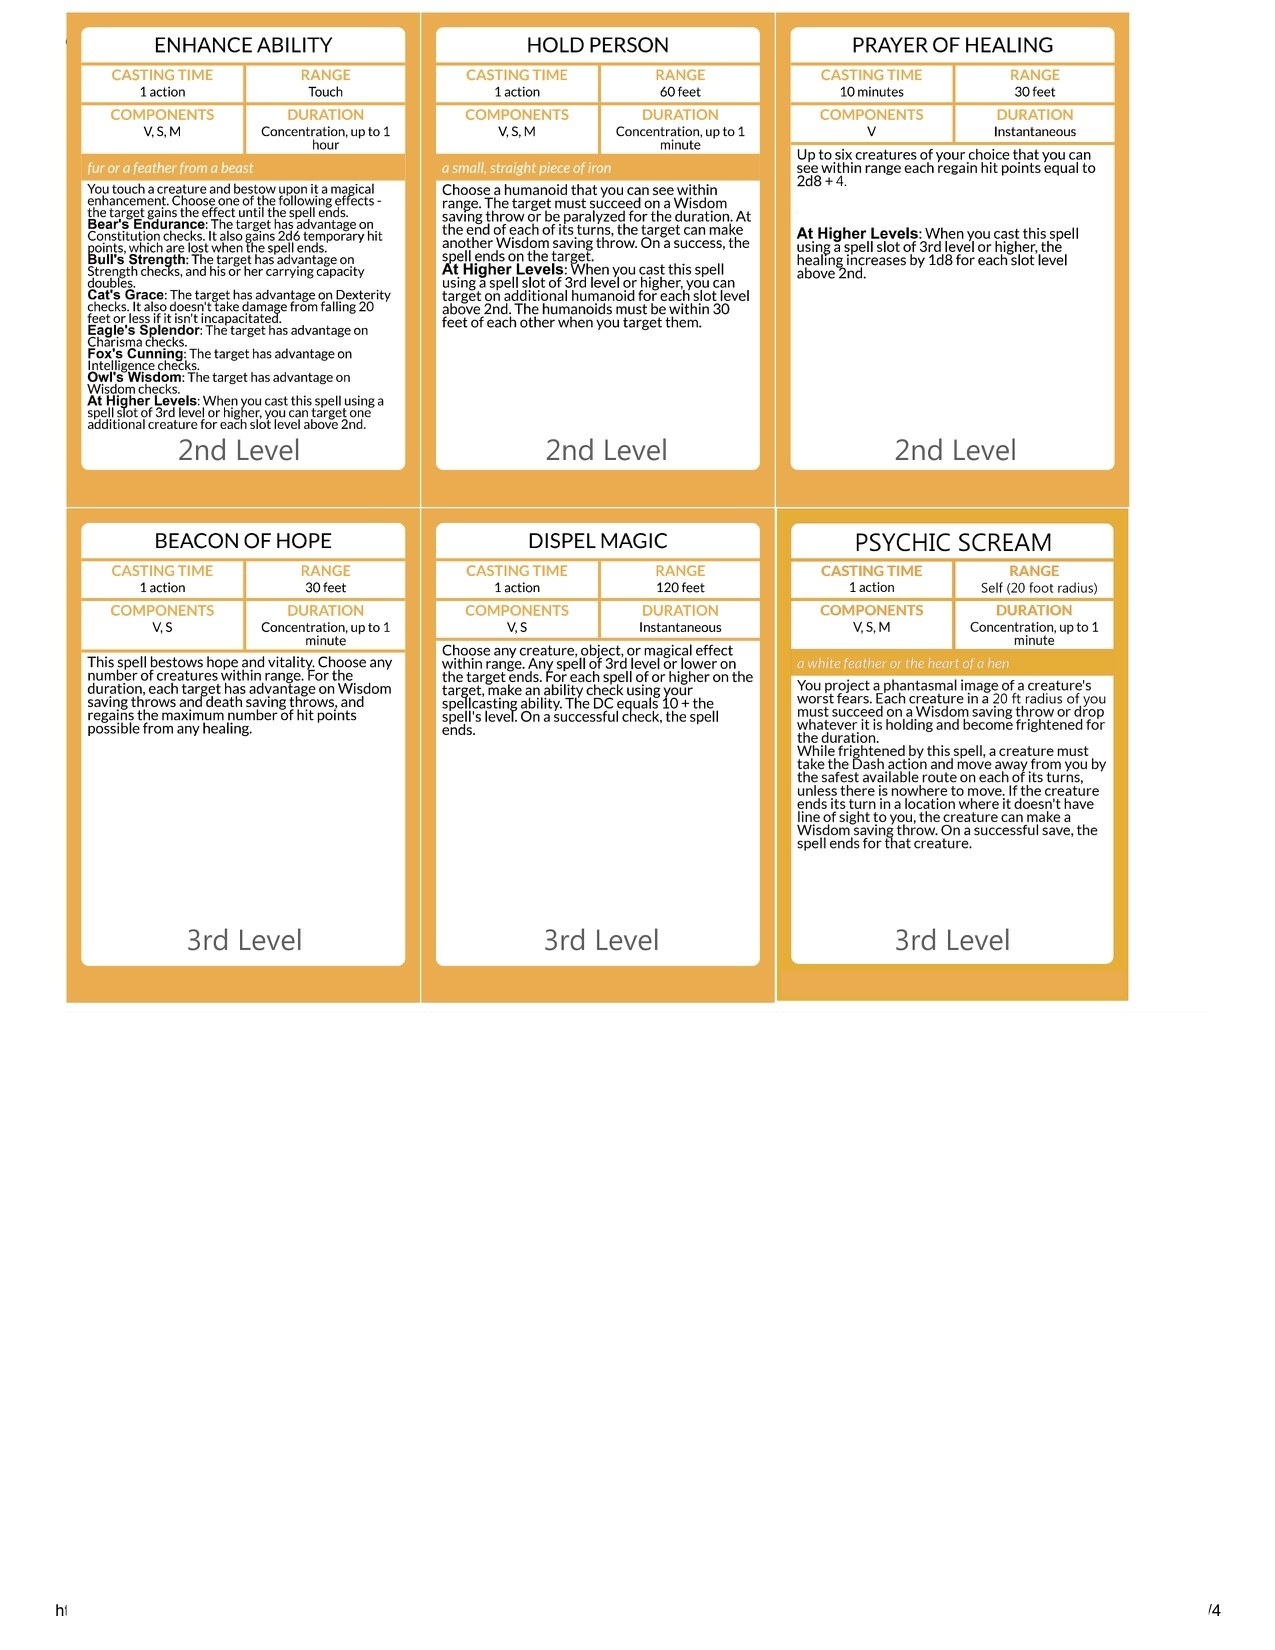 Matthew Mercer's D&D Character Sheets for WoW Classes